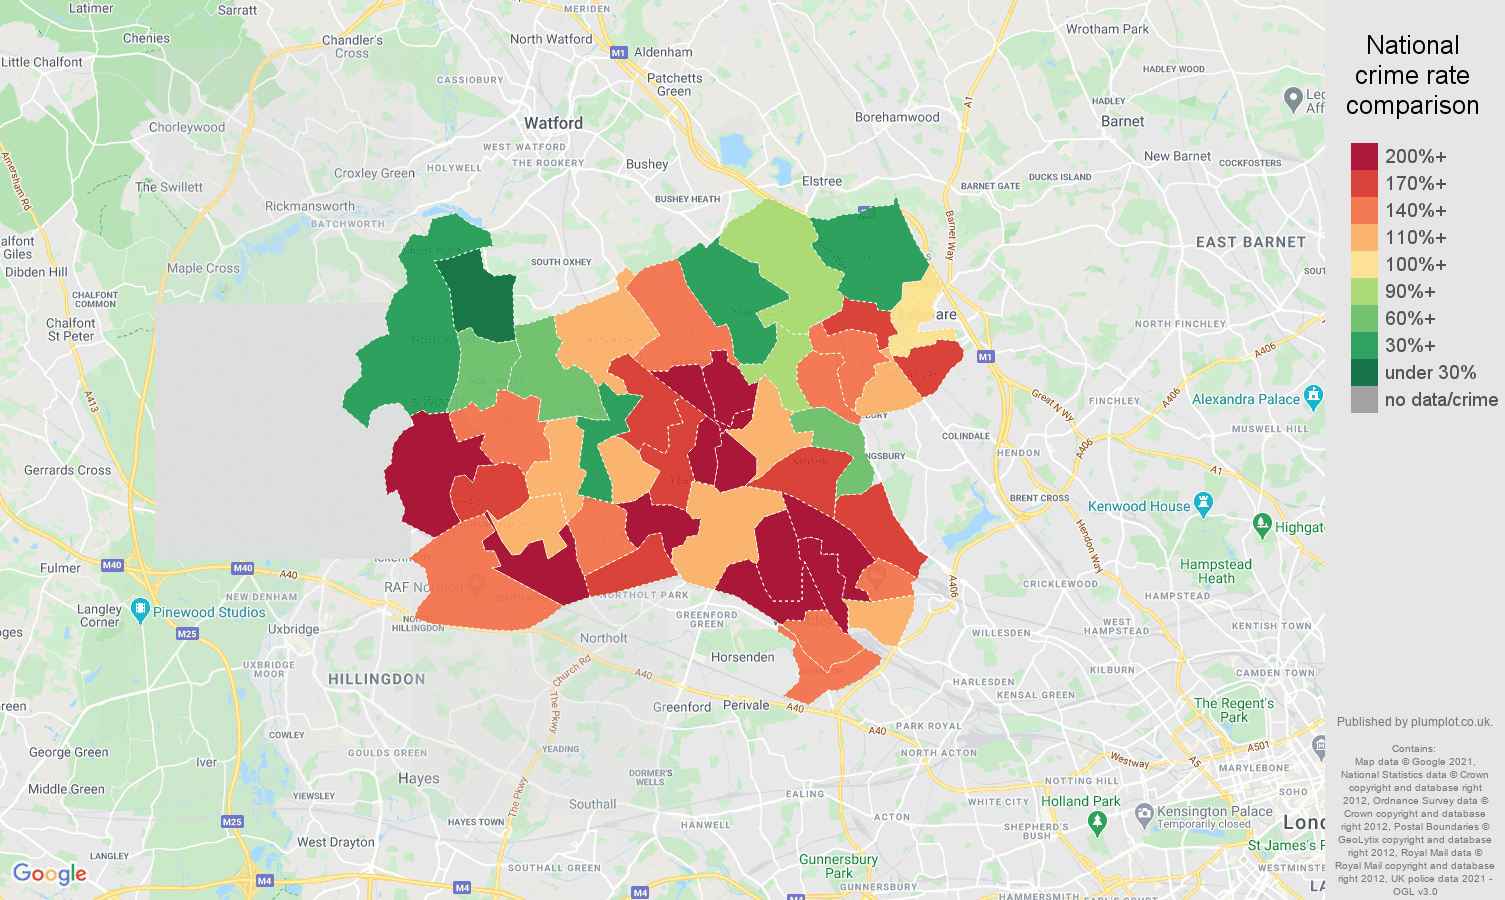 Harrow drugs crime rate comparison map